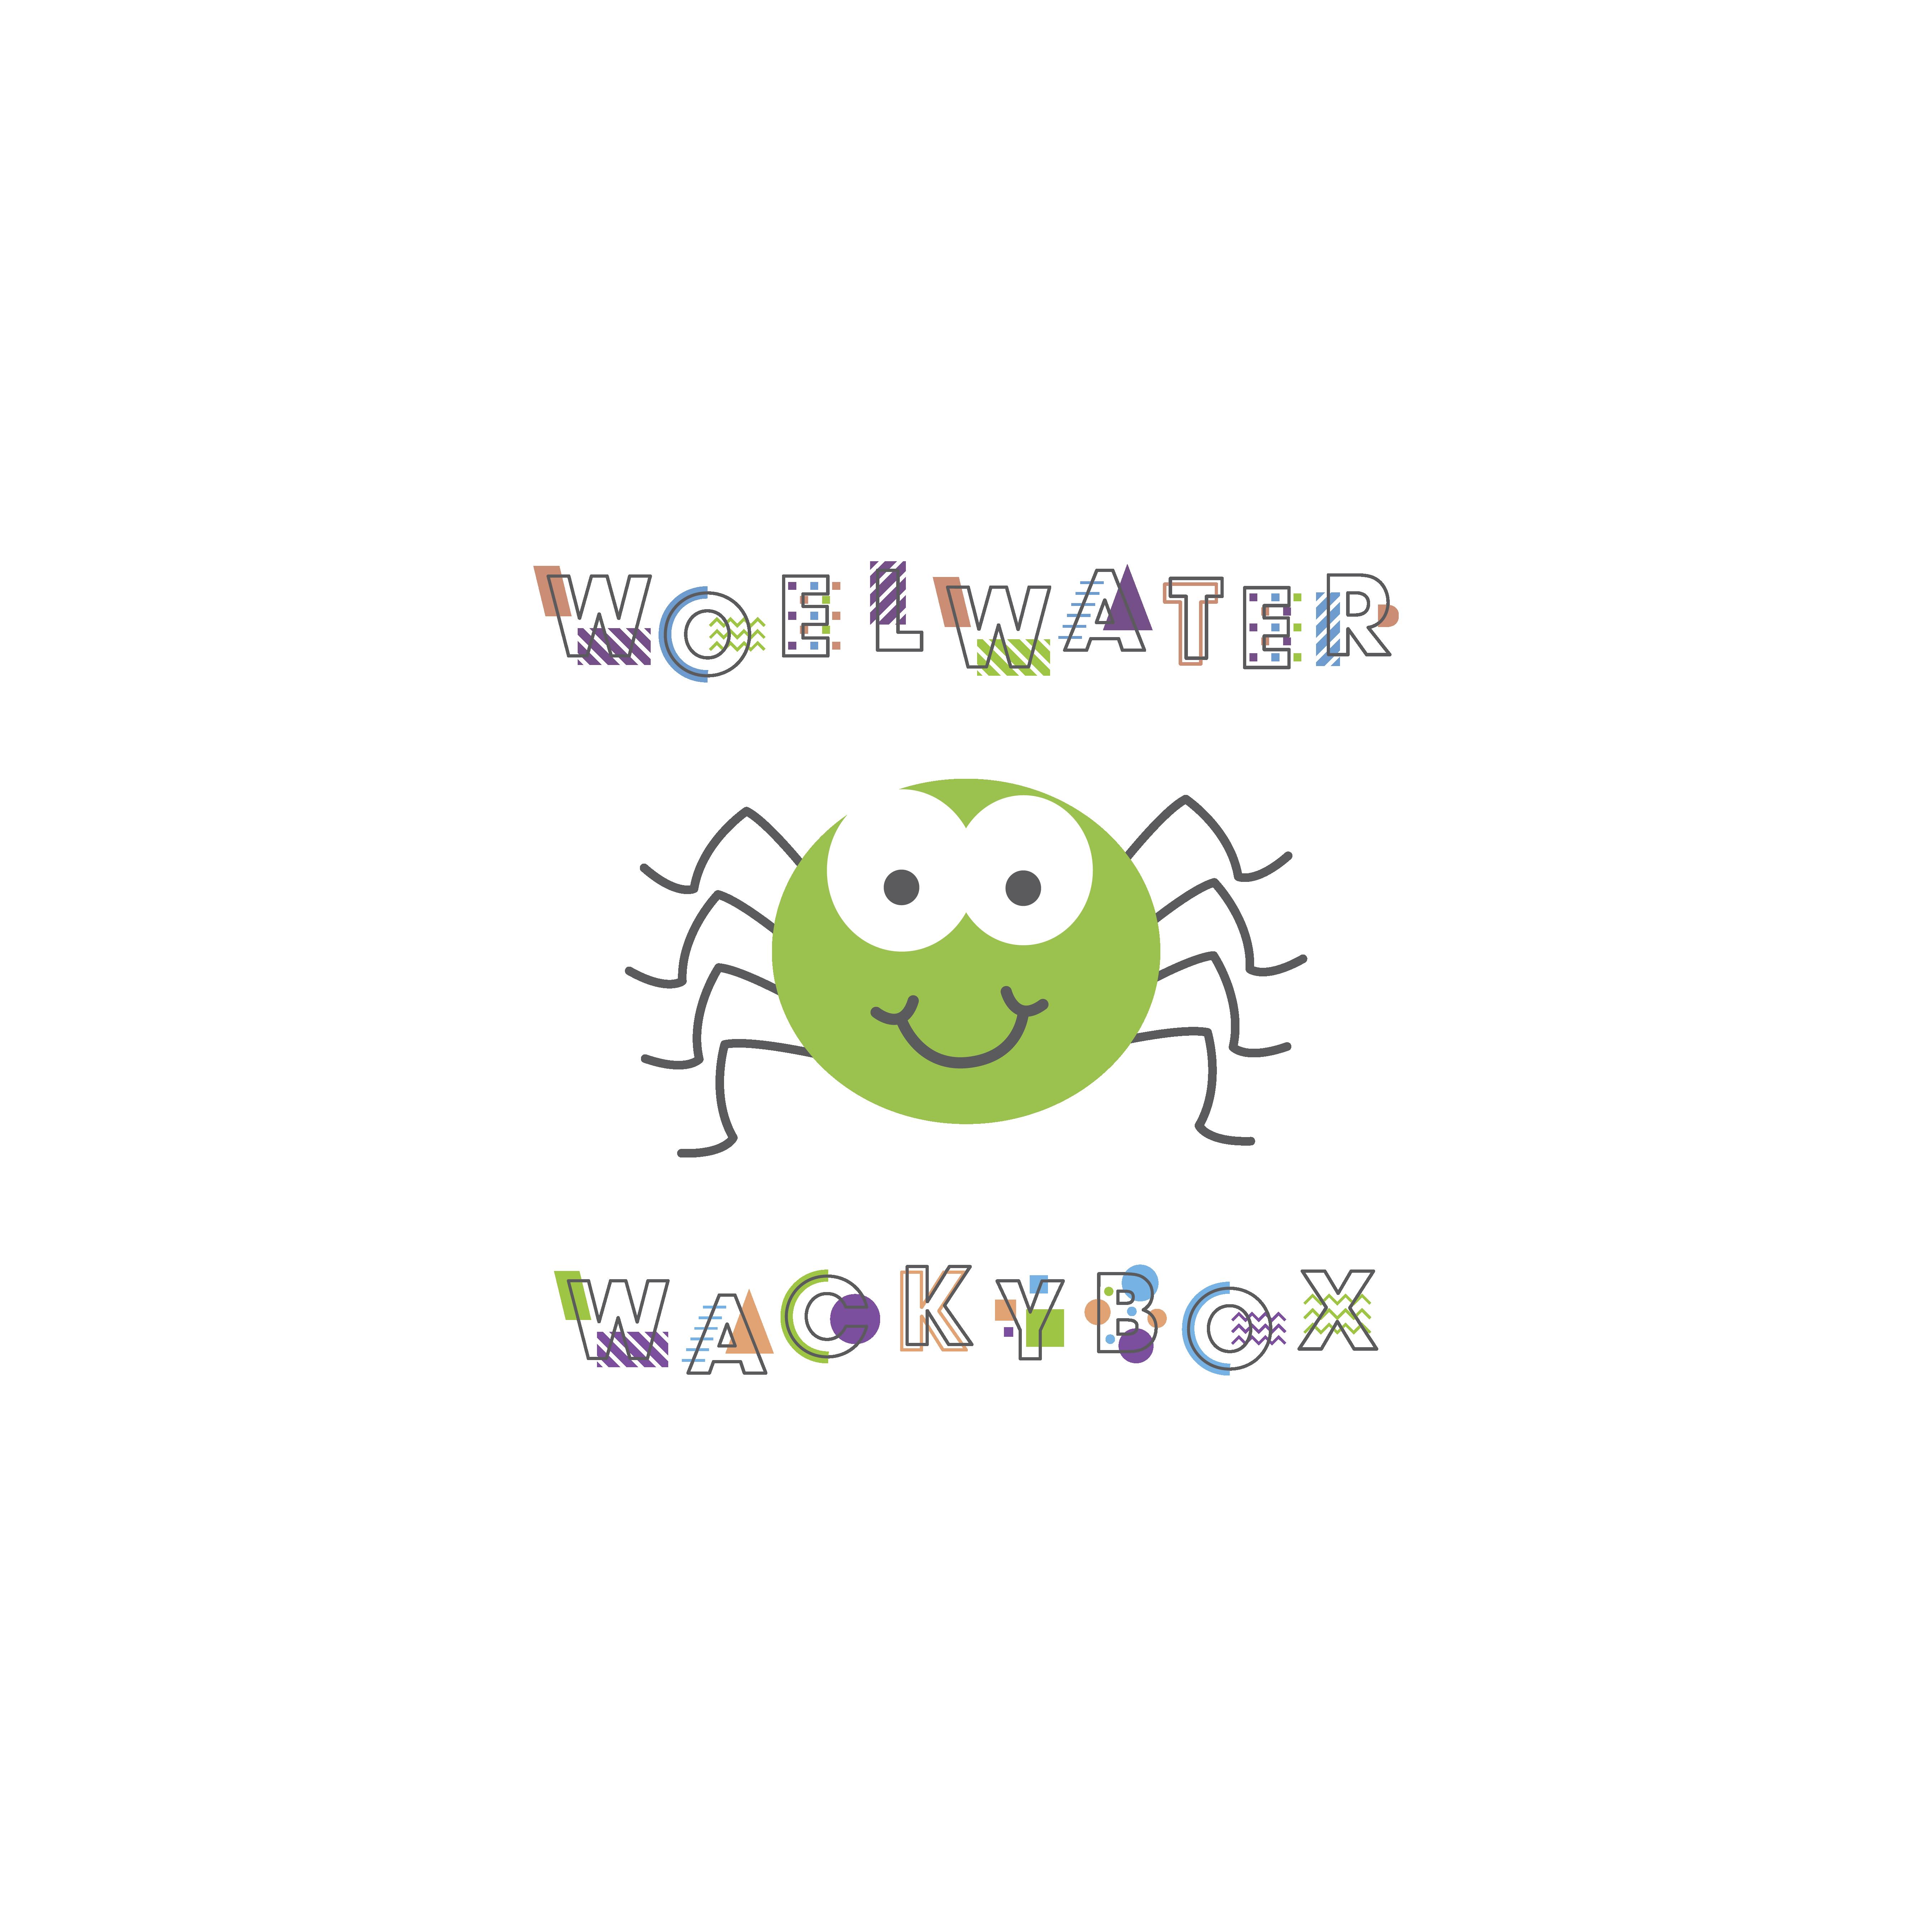 WOELWATER_LOGO